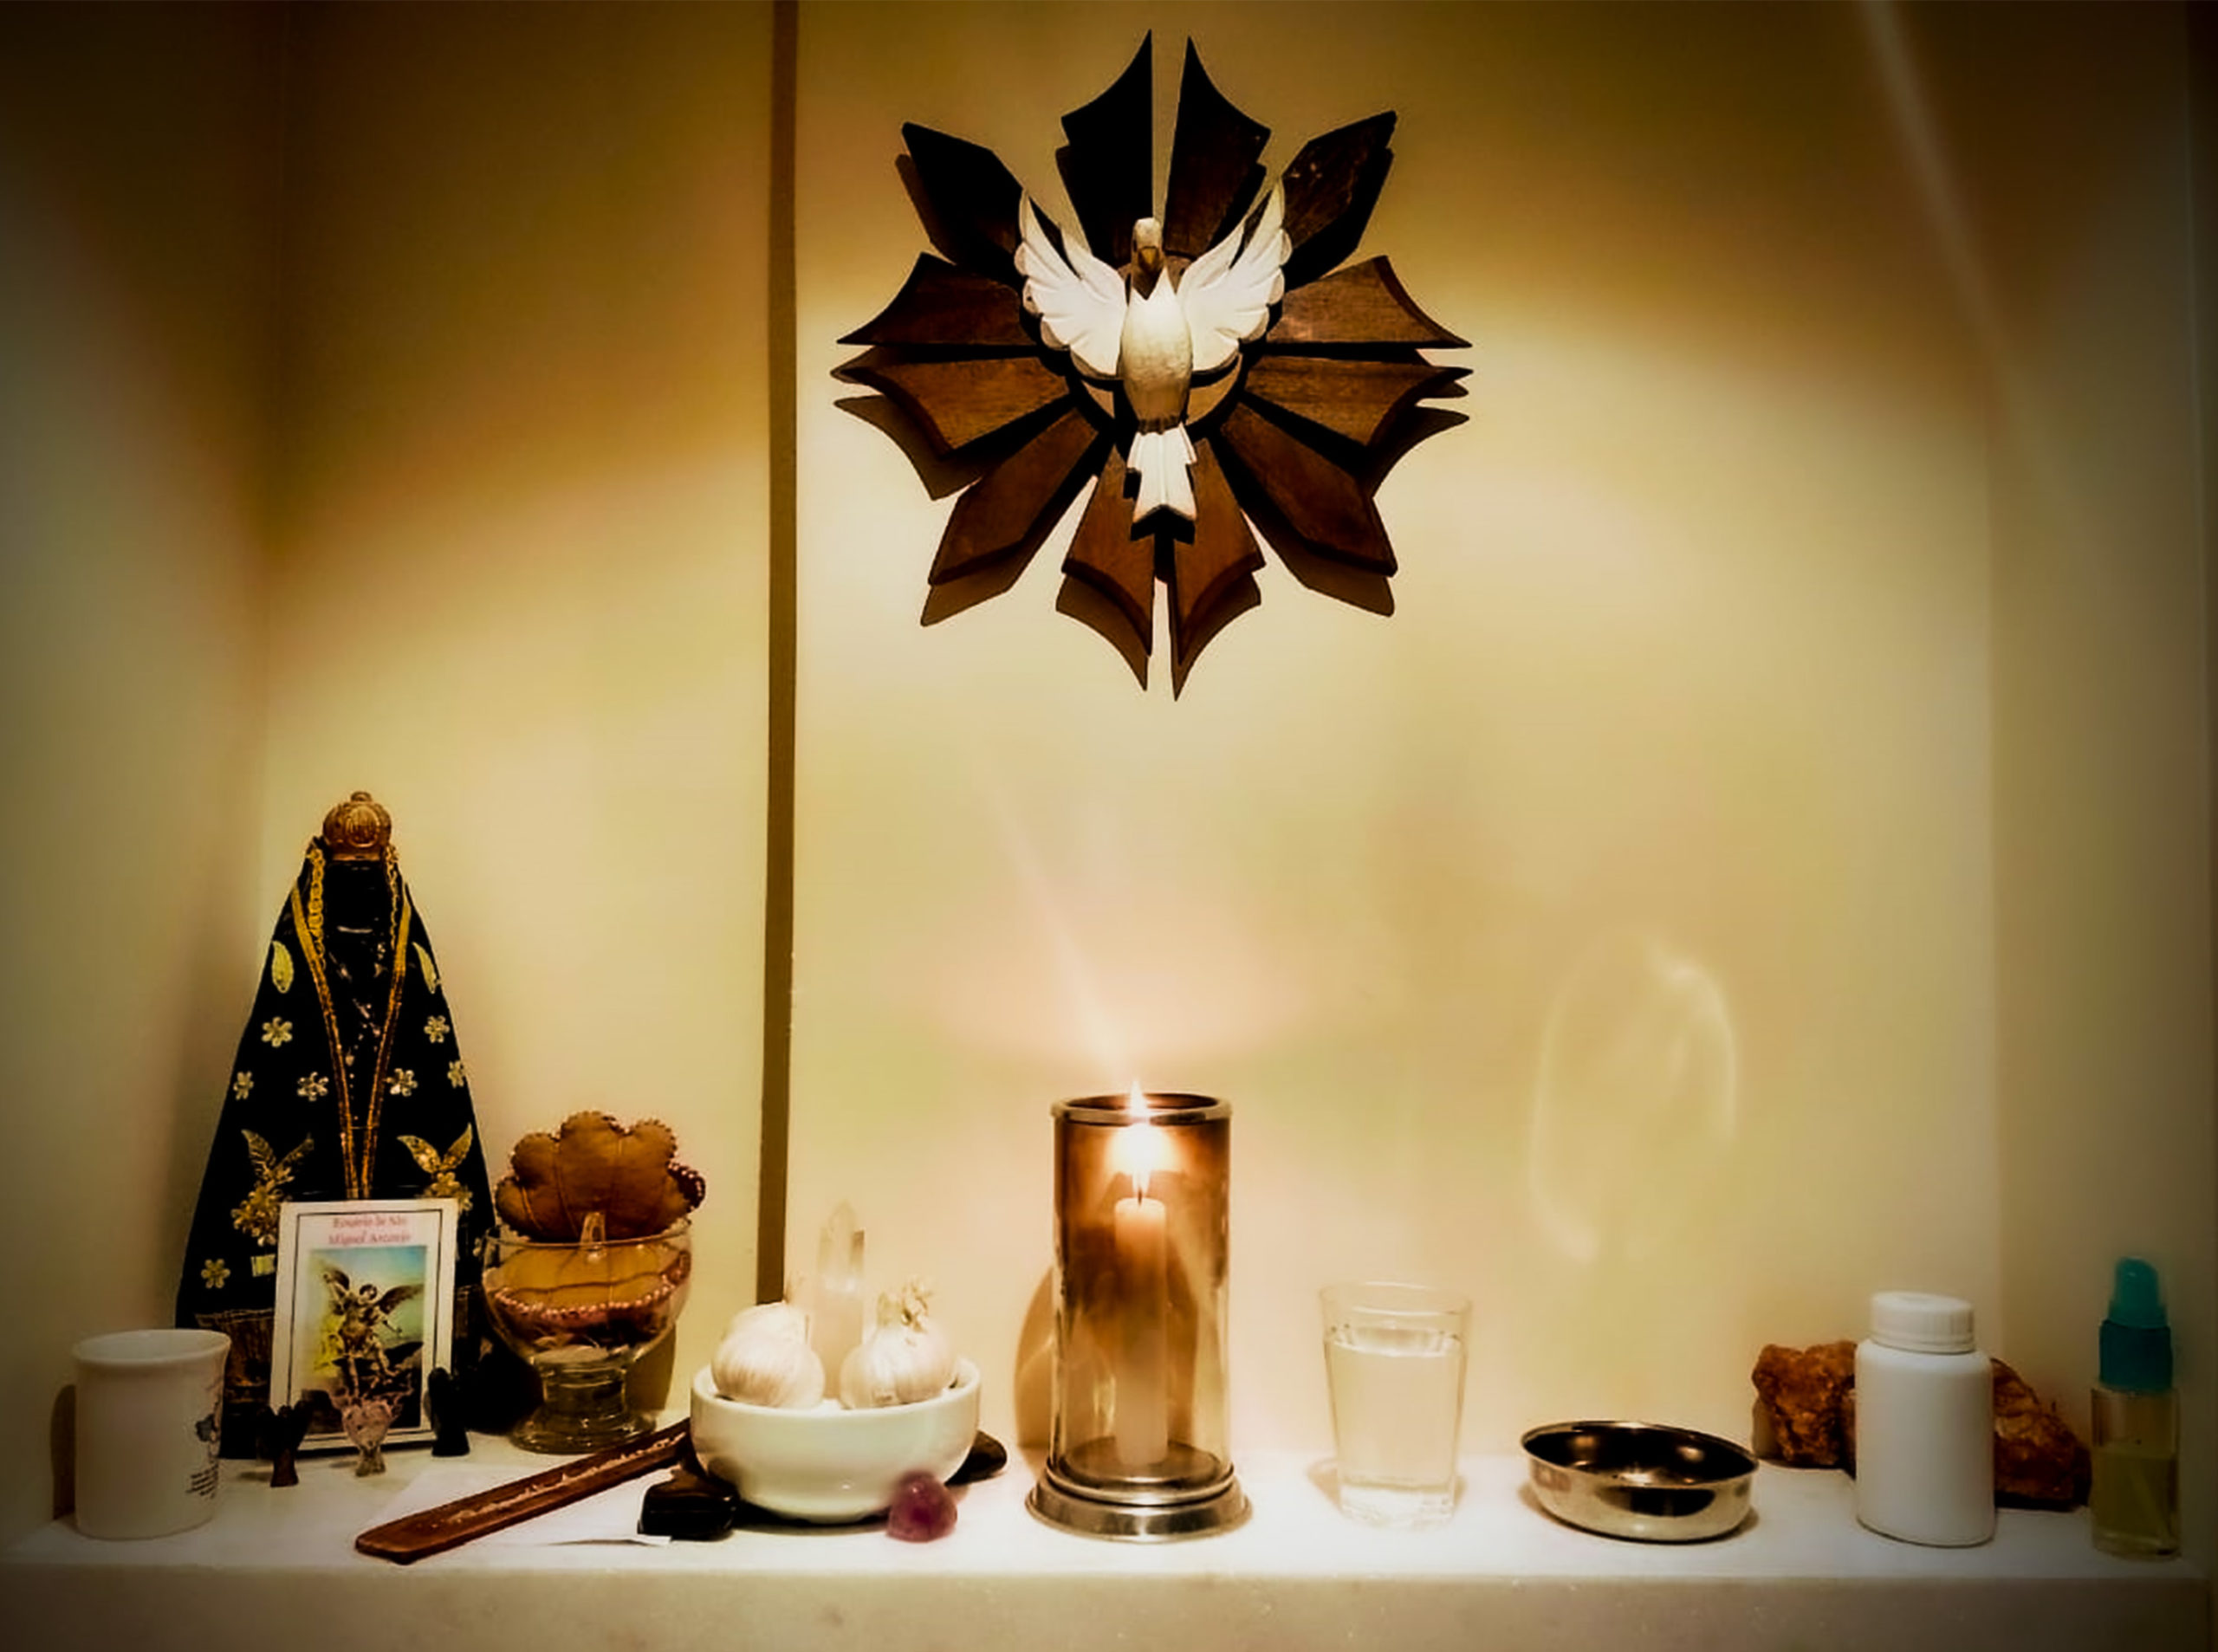 Sincretismo religioso une religiões em altar doméstico (Foto: Carlos Lara)